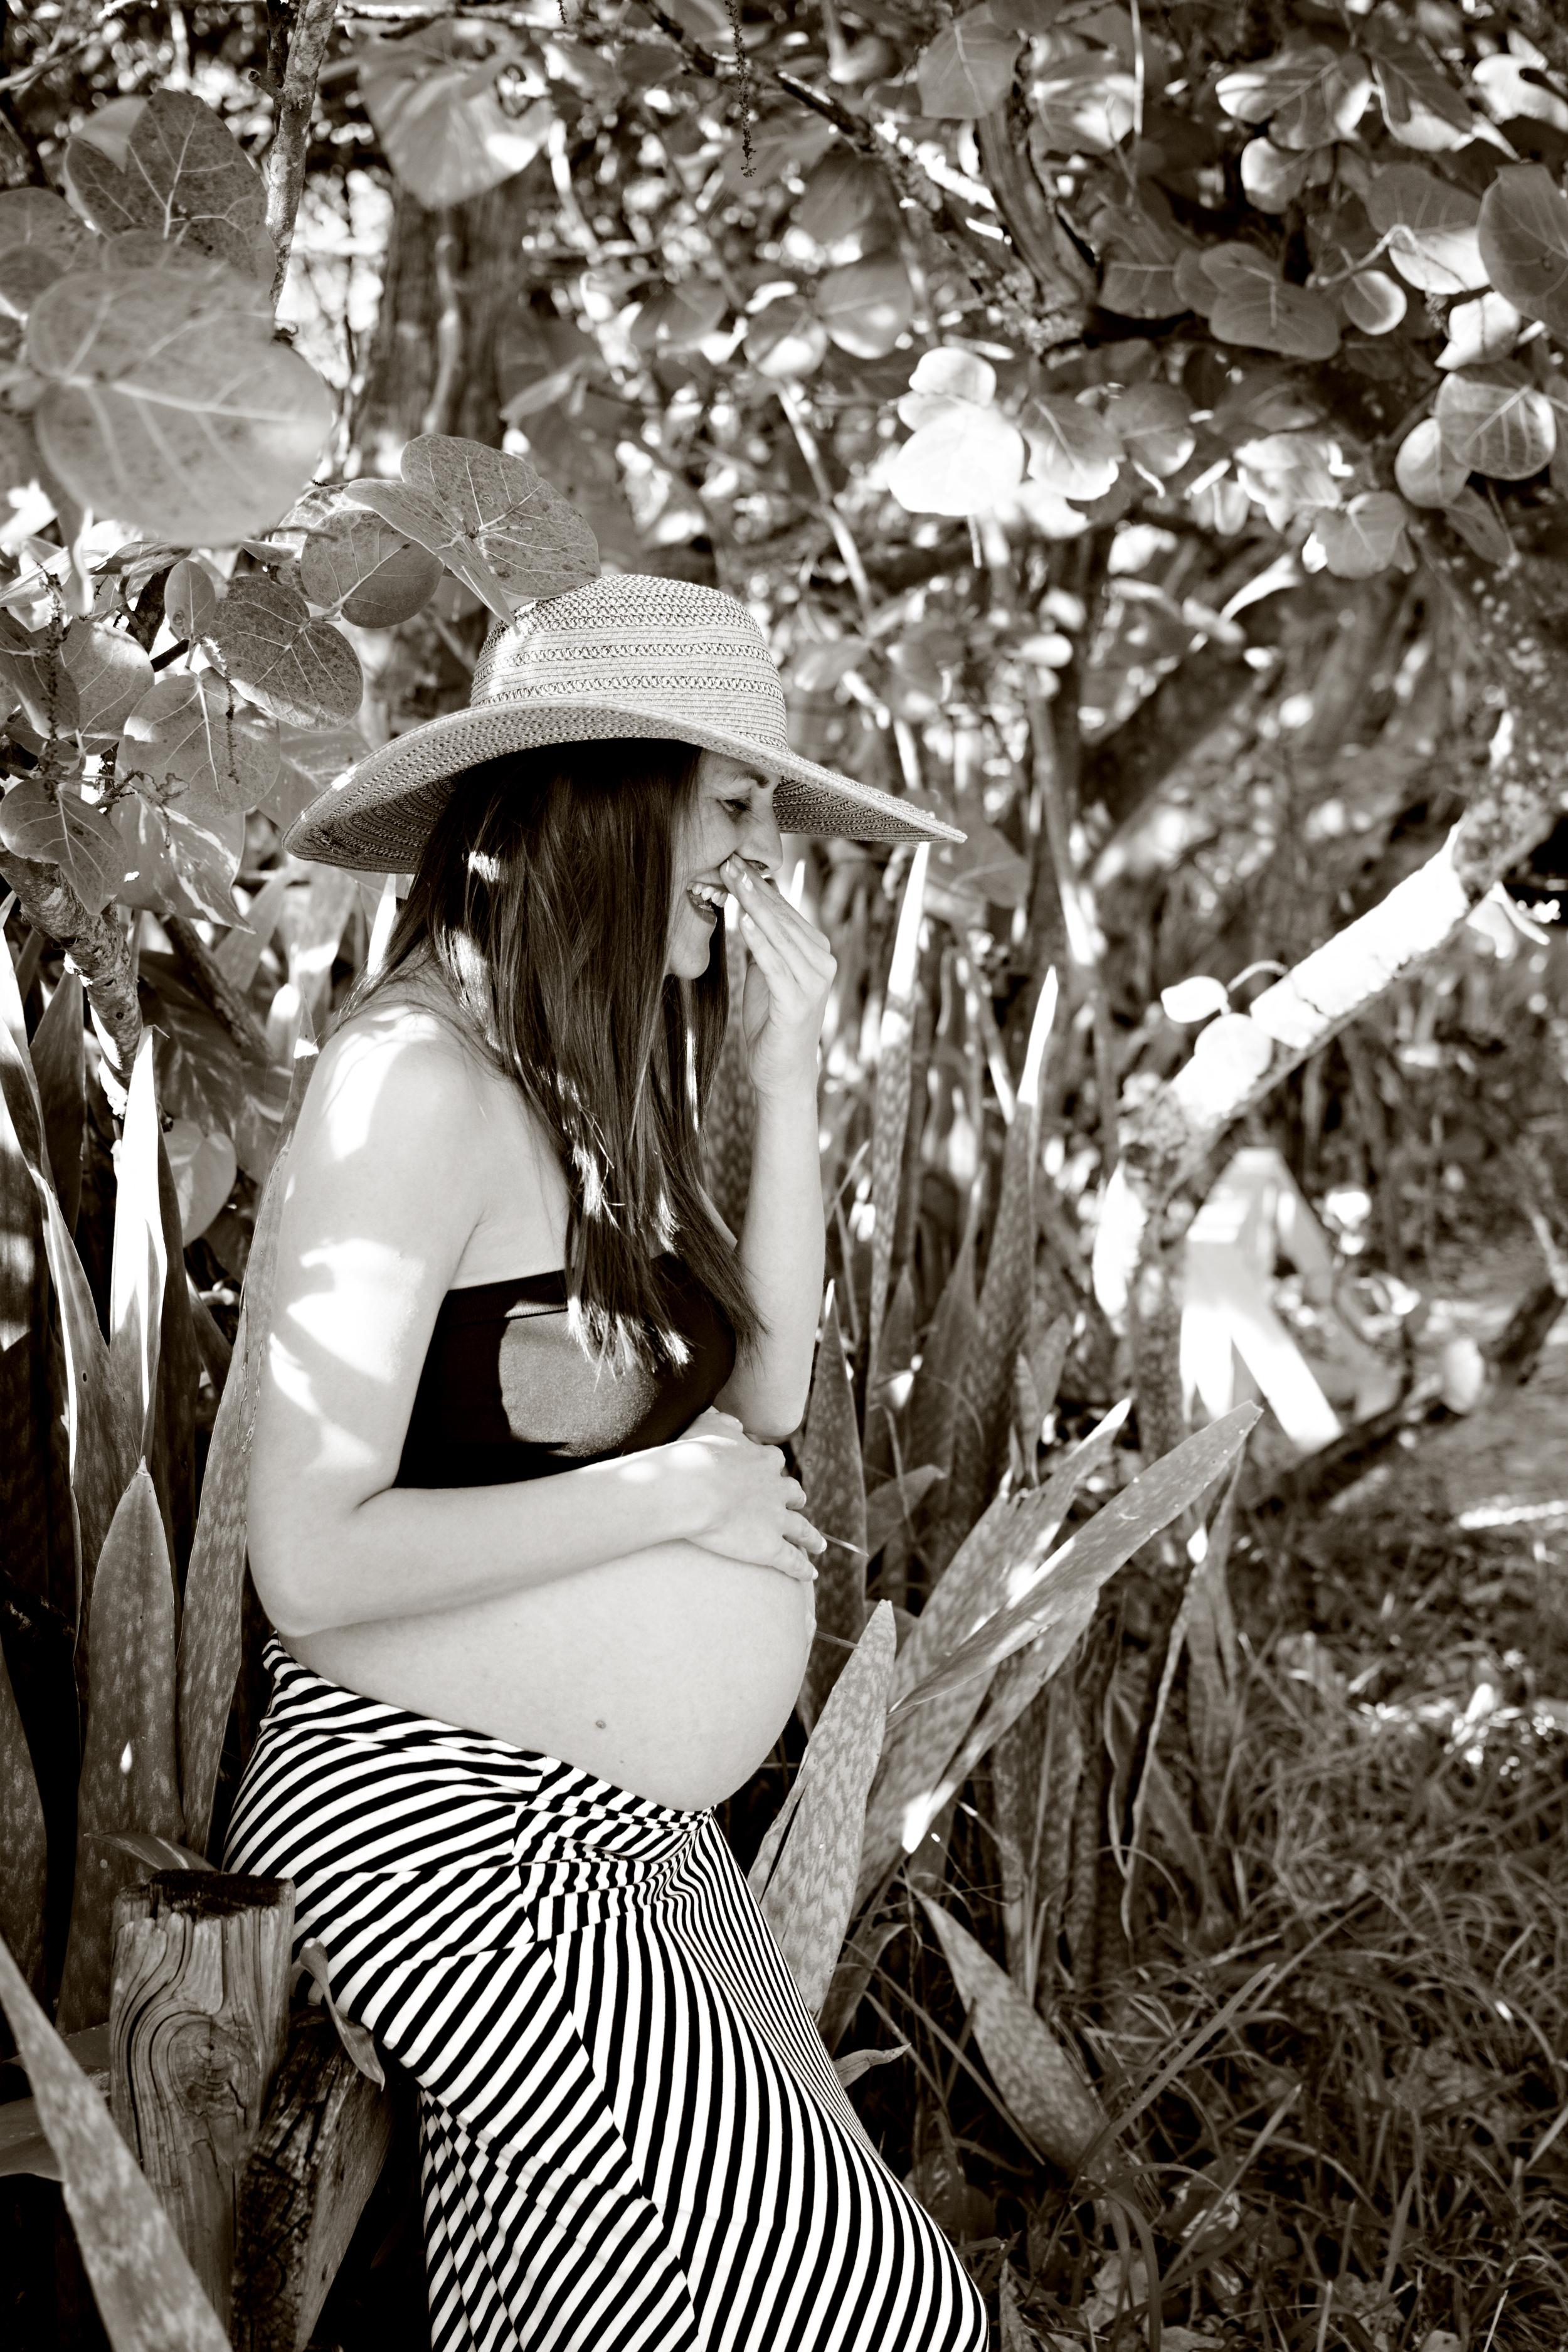 Carlie-Chew-Photography-Maternity-Photographer-Tampa-Florida